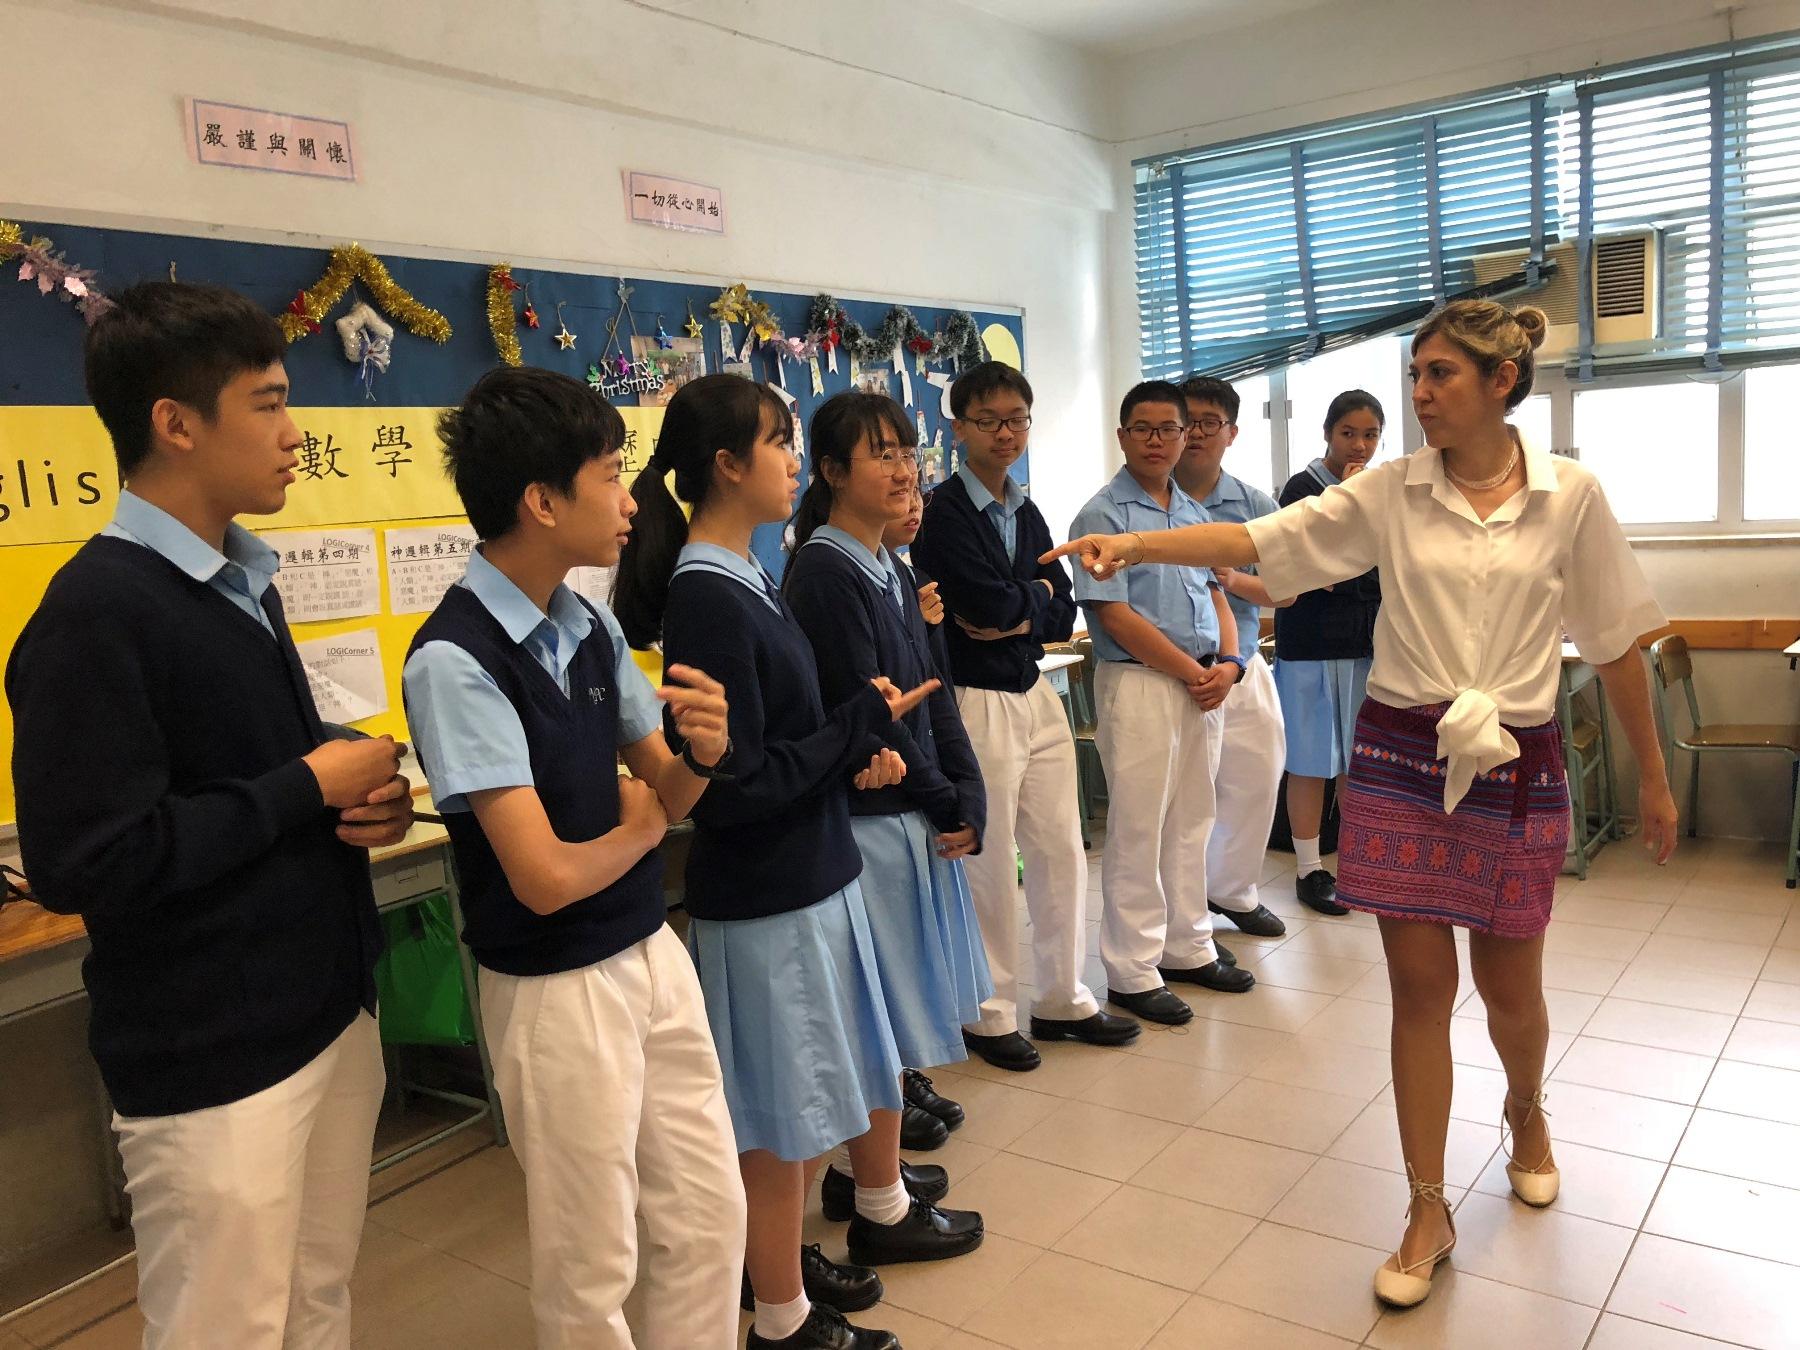 http://npc.edu.hk/sites/default/files/img_3561.jpg